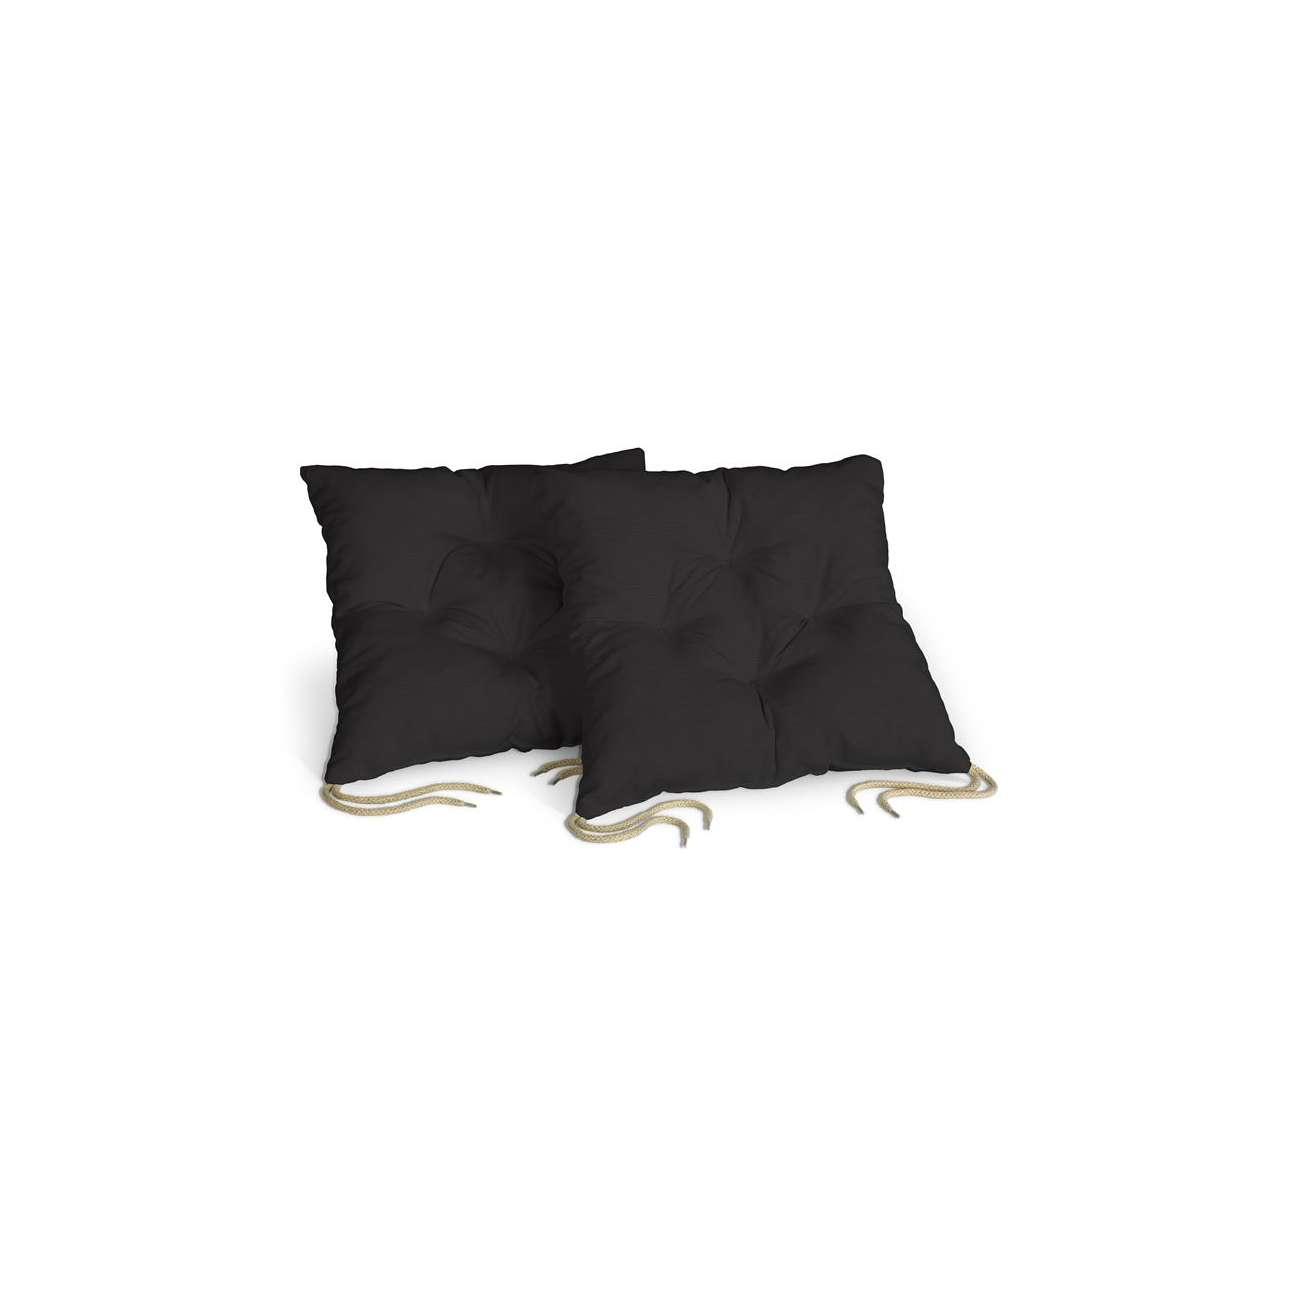 Sedáky 2-pack Cotton Panama 04 (702-09)